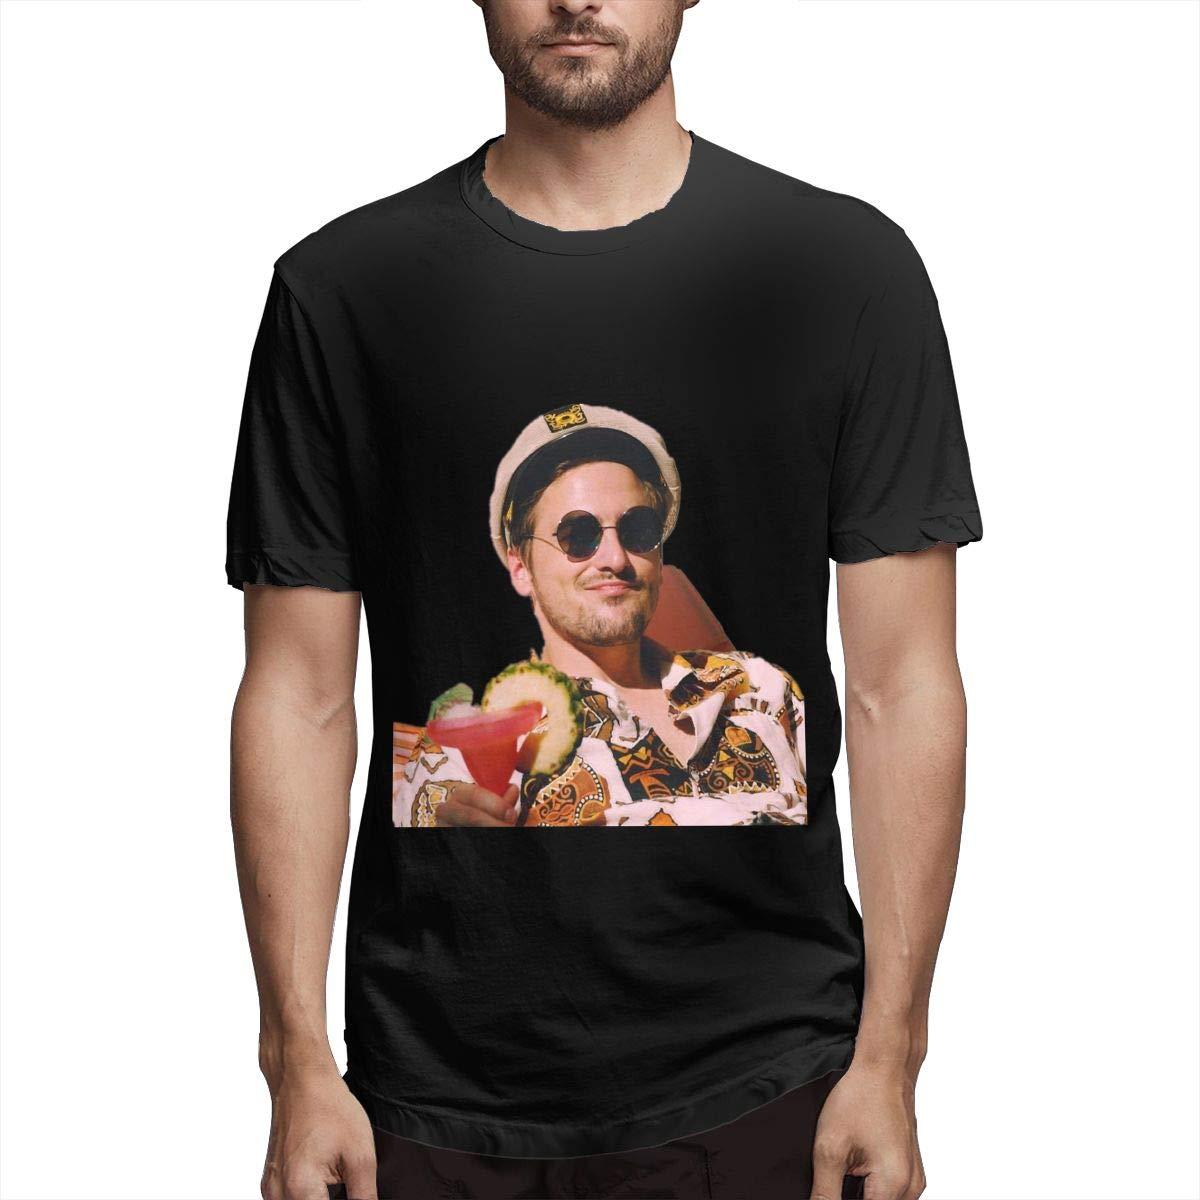 Lihehen Big Time Rush Fashion Leisure Round Neck T Shirt